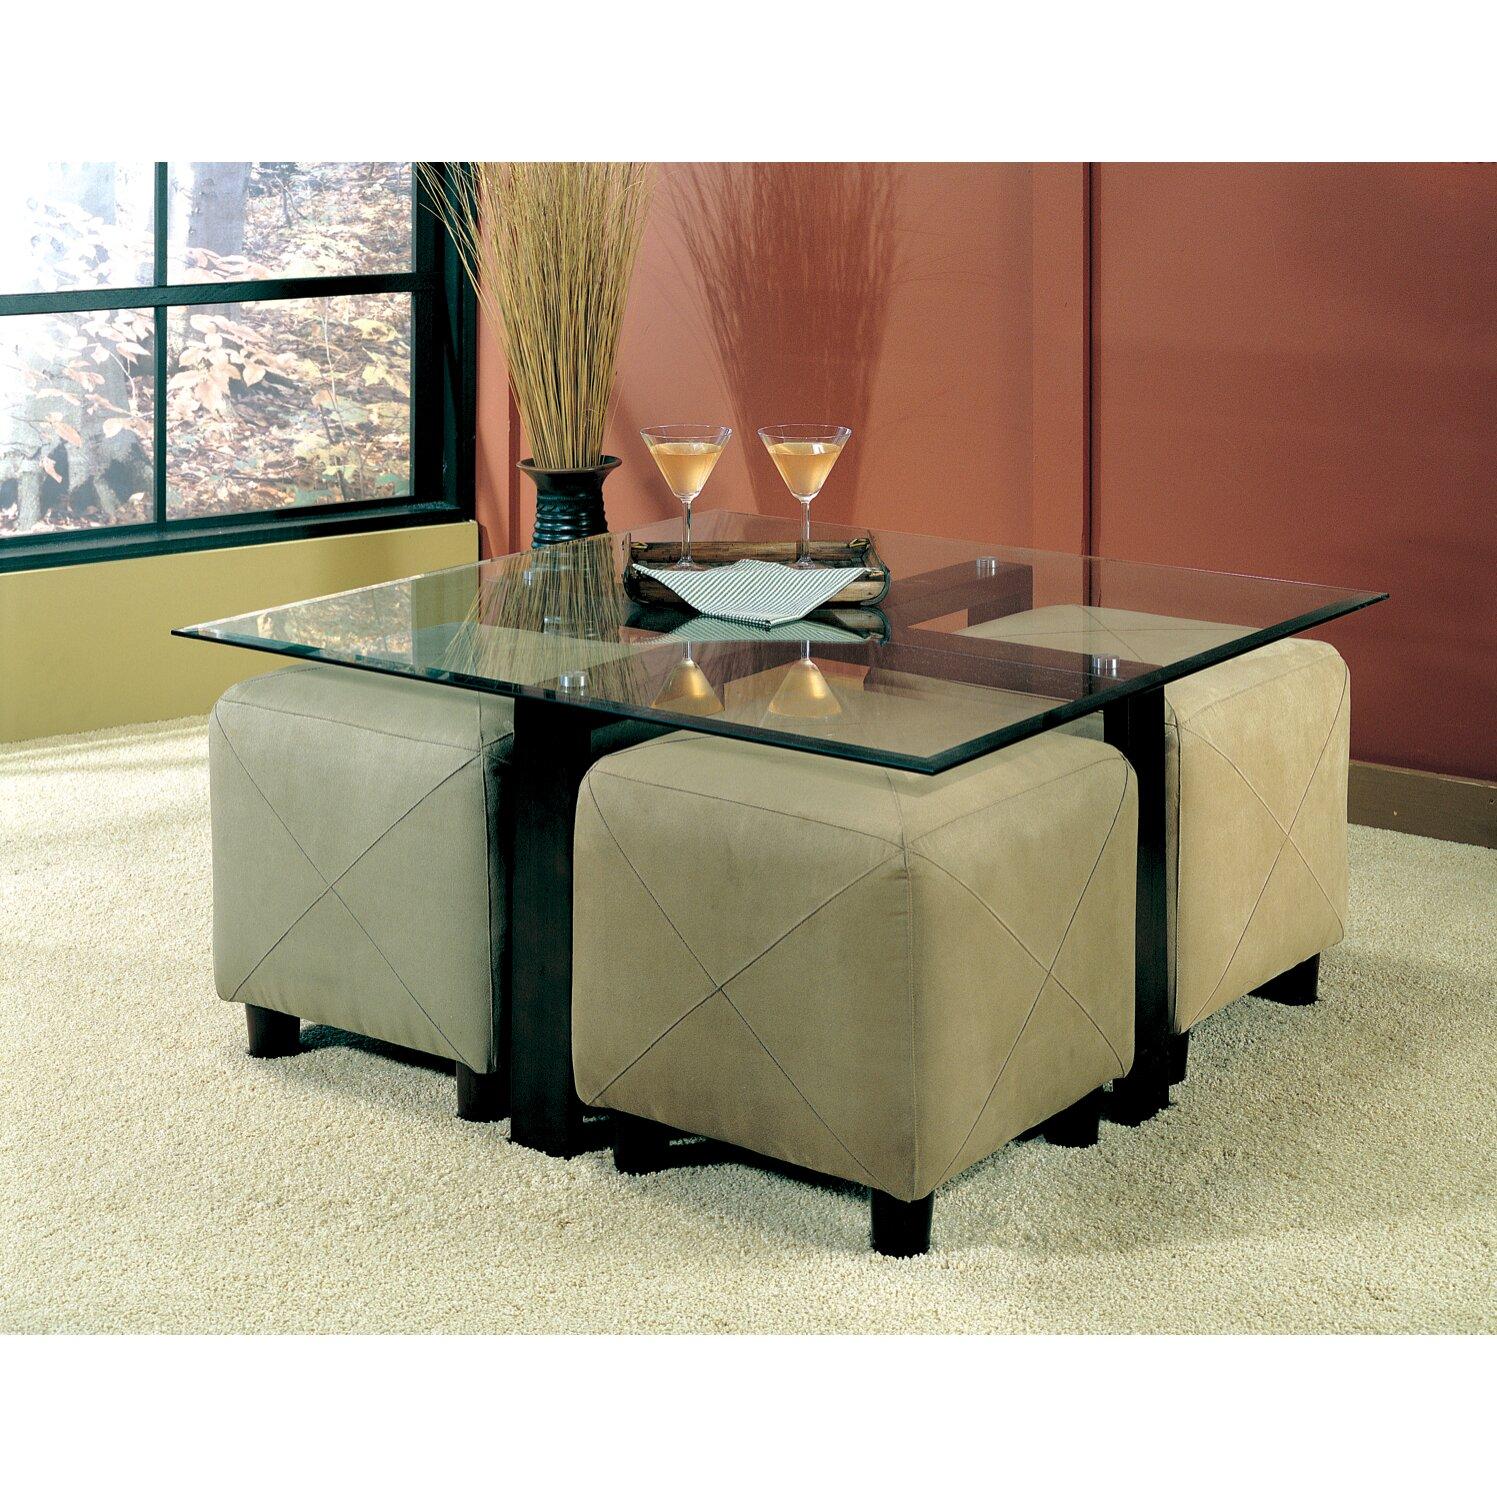 Wildon Home ® Hines Coffee Table & Reviews